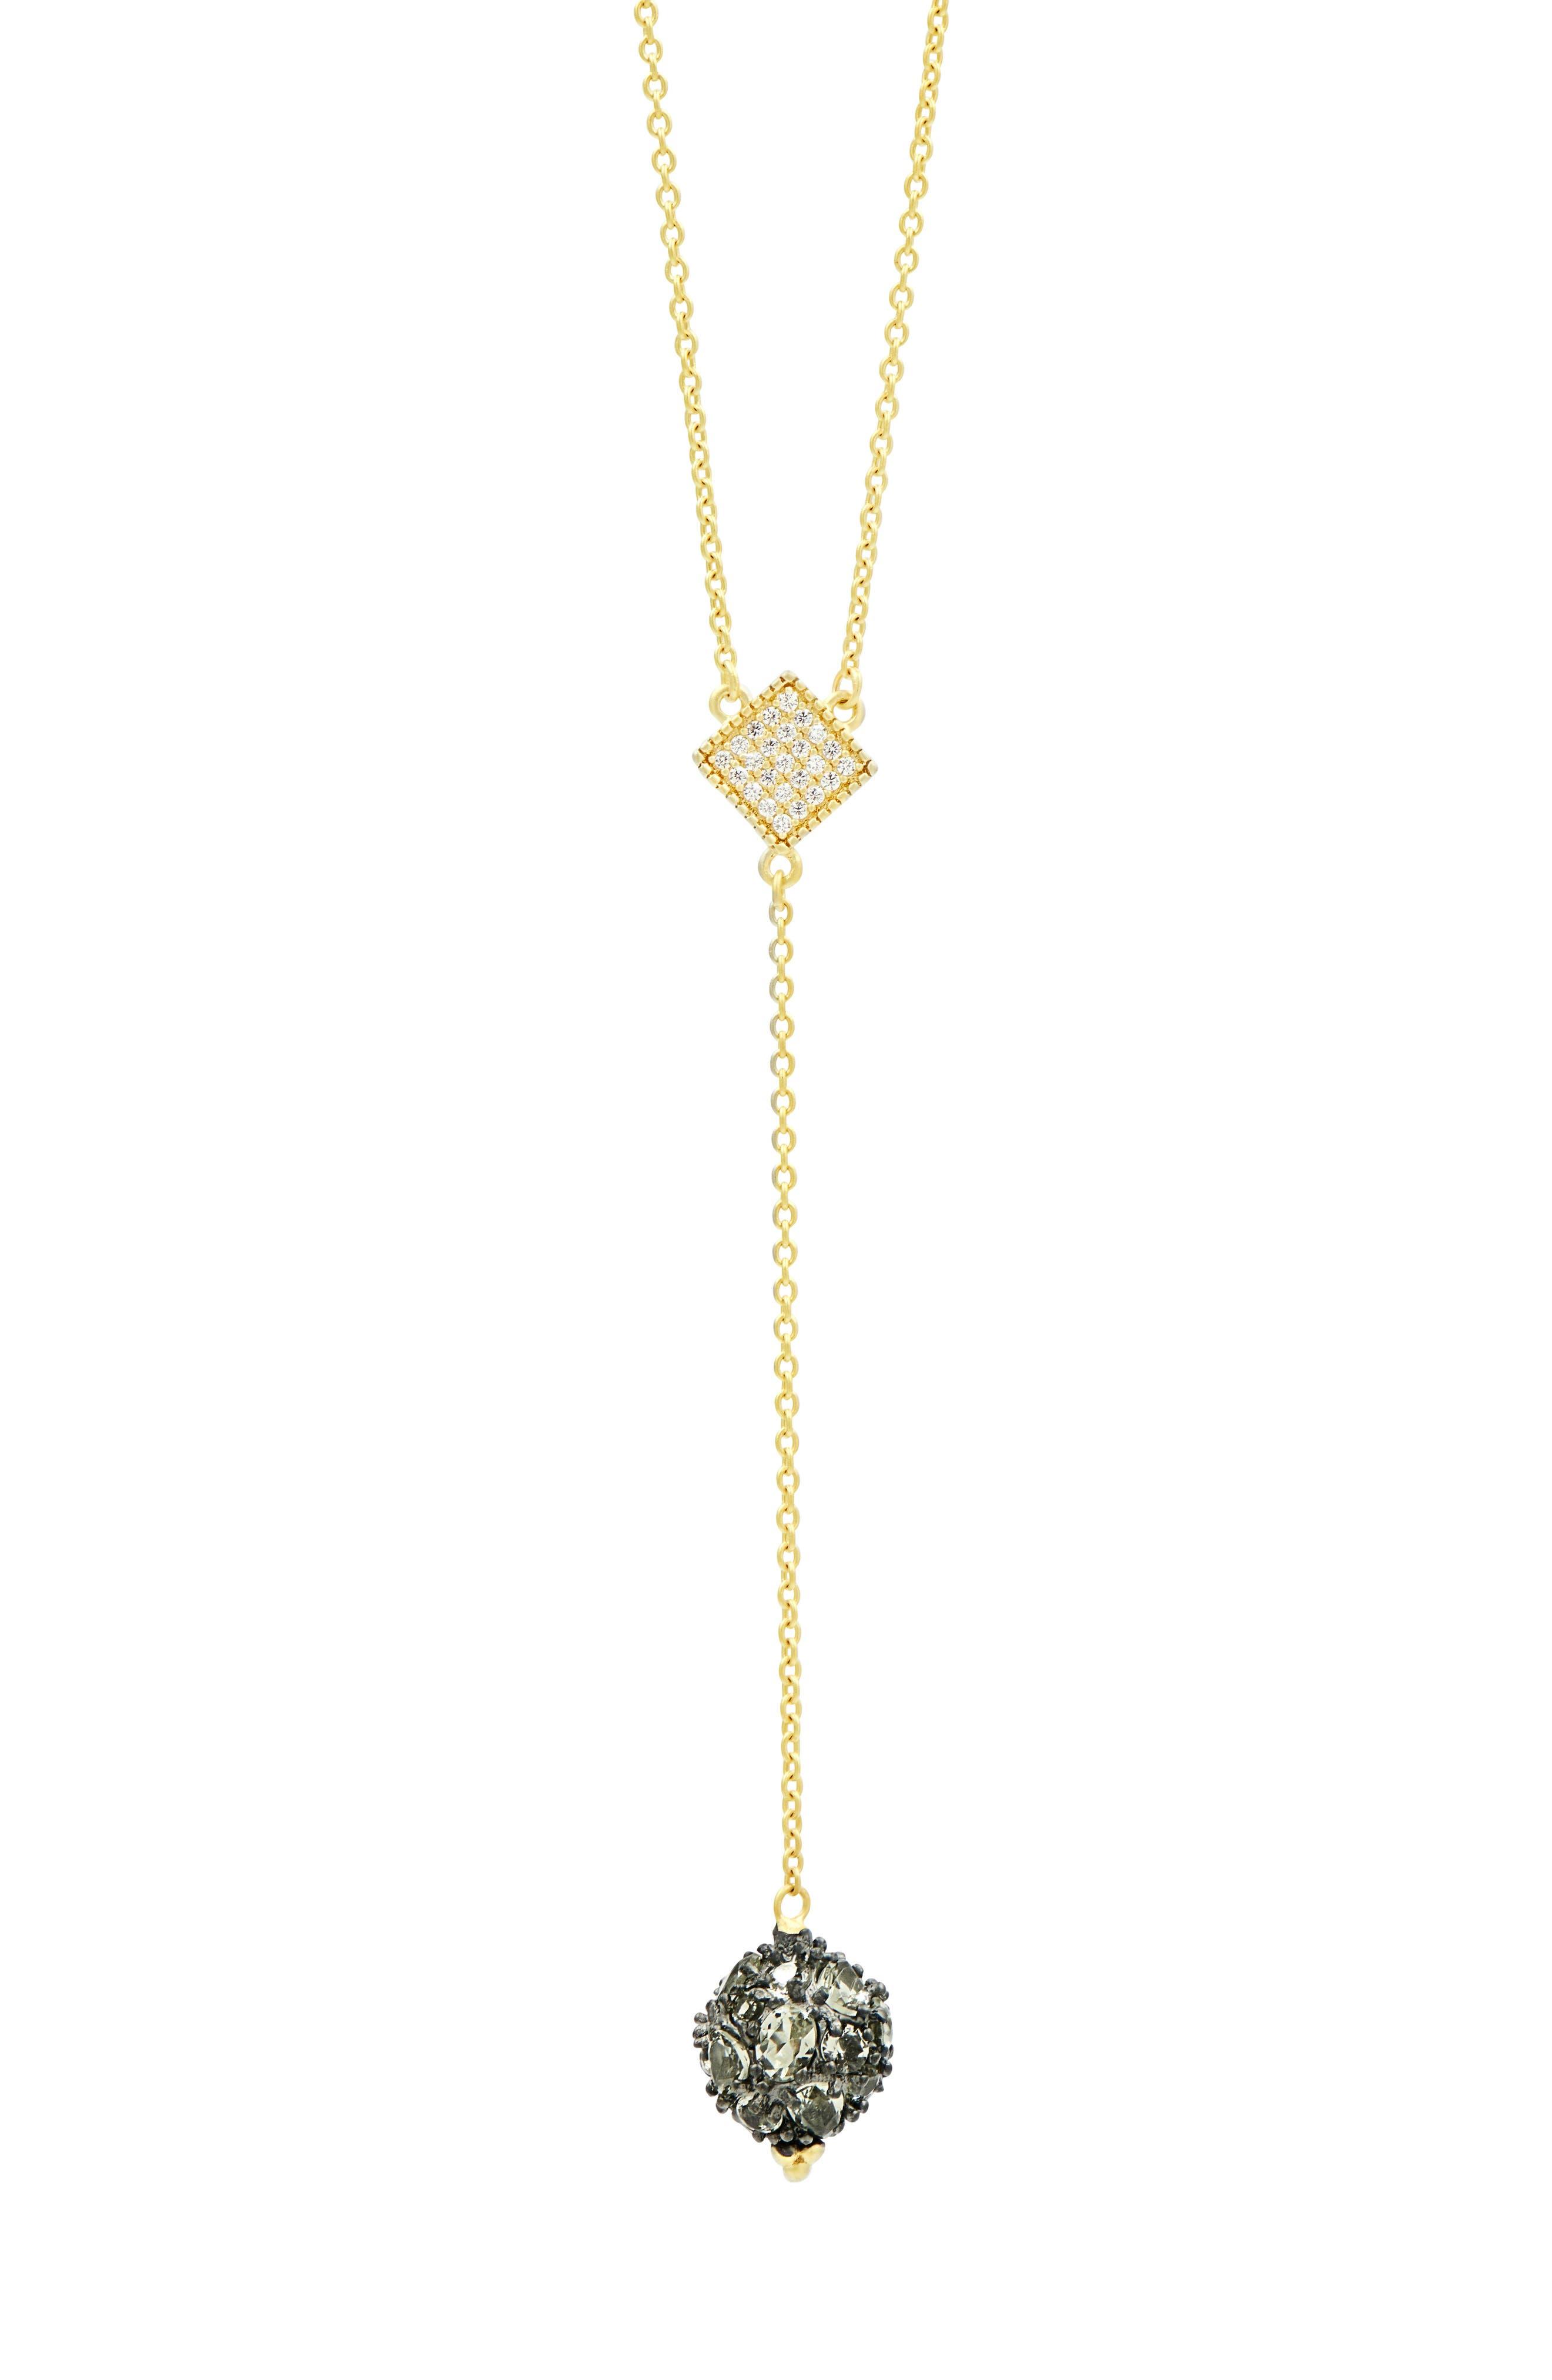 FREIDA ROTHMAN Rose Dor Y-Shape Necklace